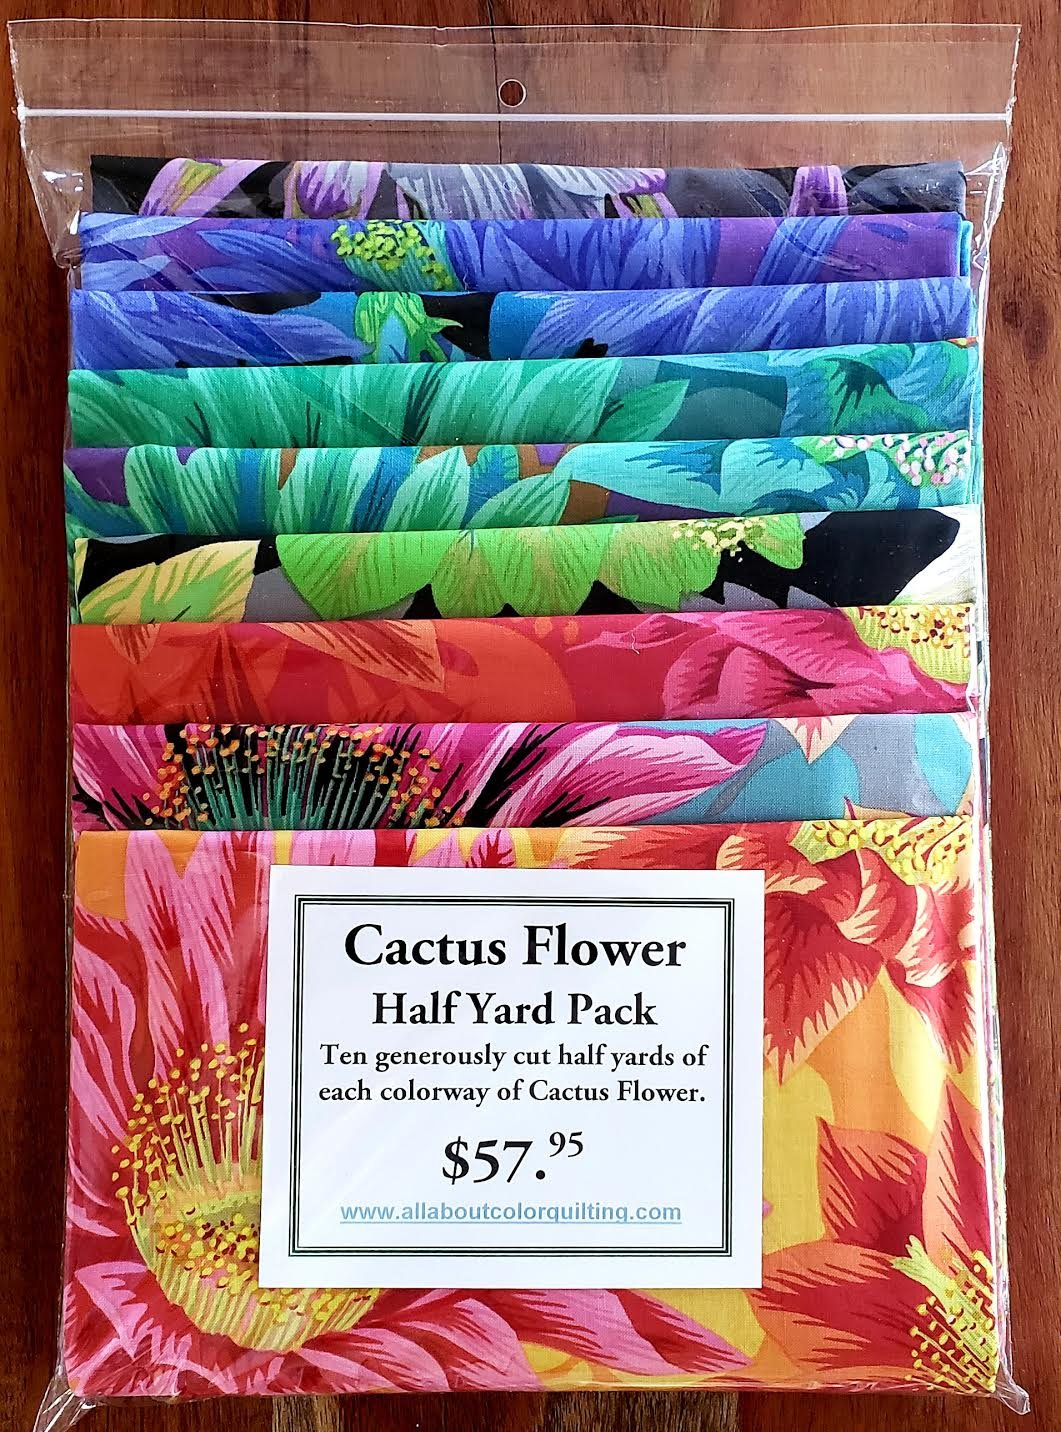 Cactus Flower Packet of Ten Half Yards